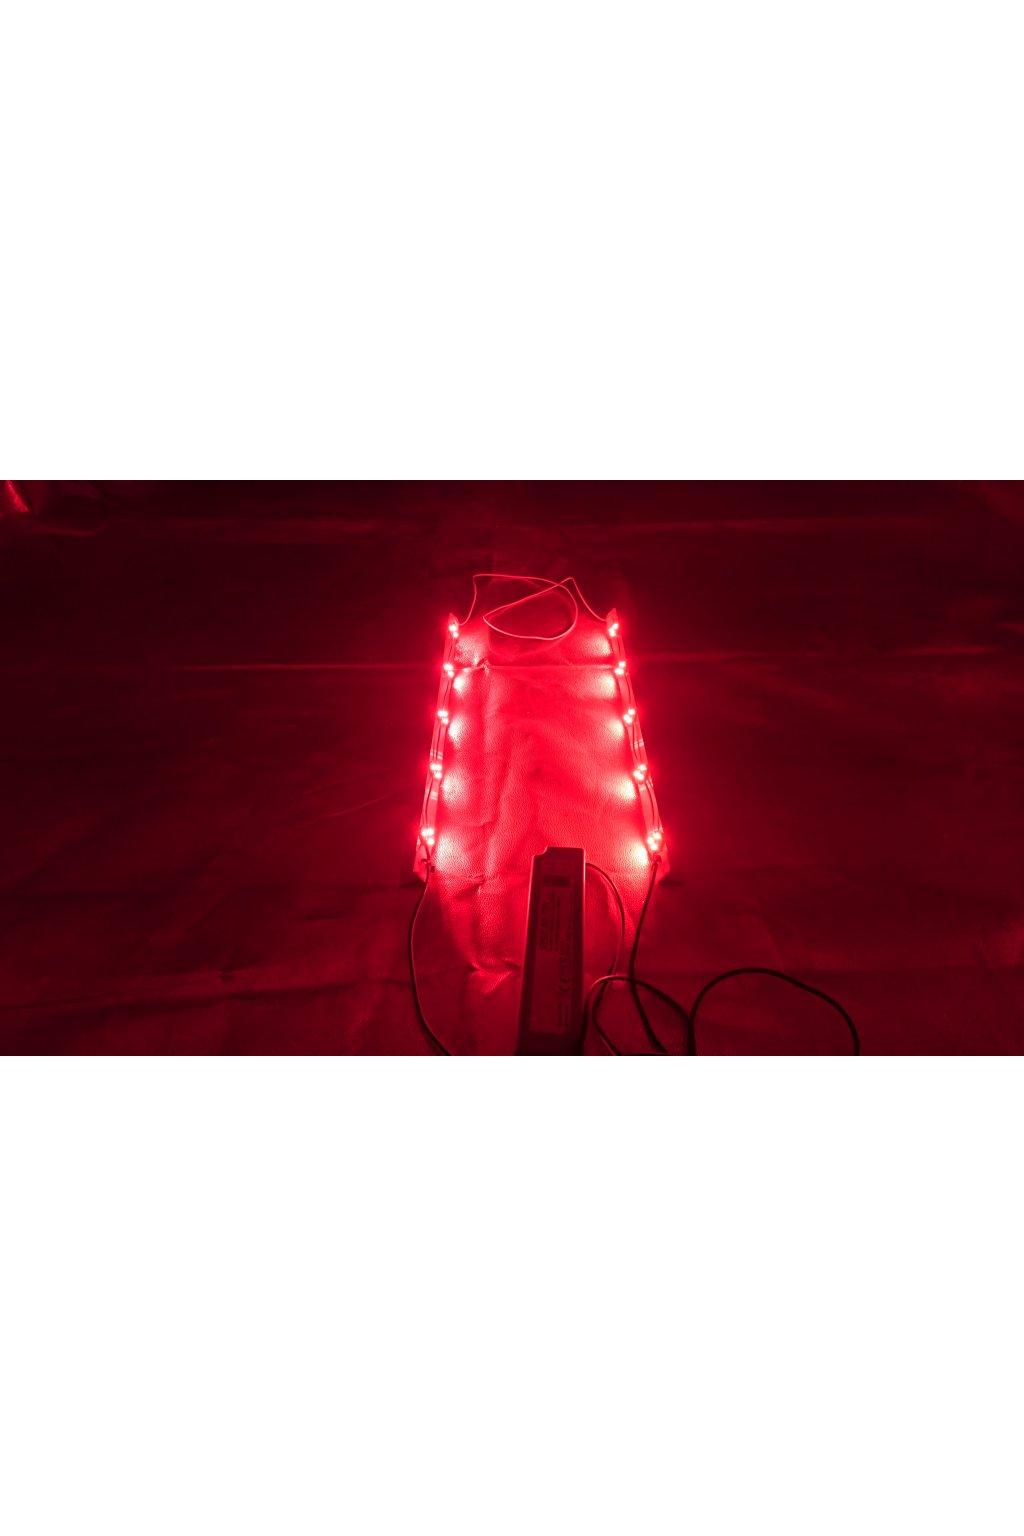 Samsung red 660 nm 30 ks/50W